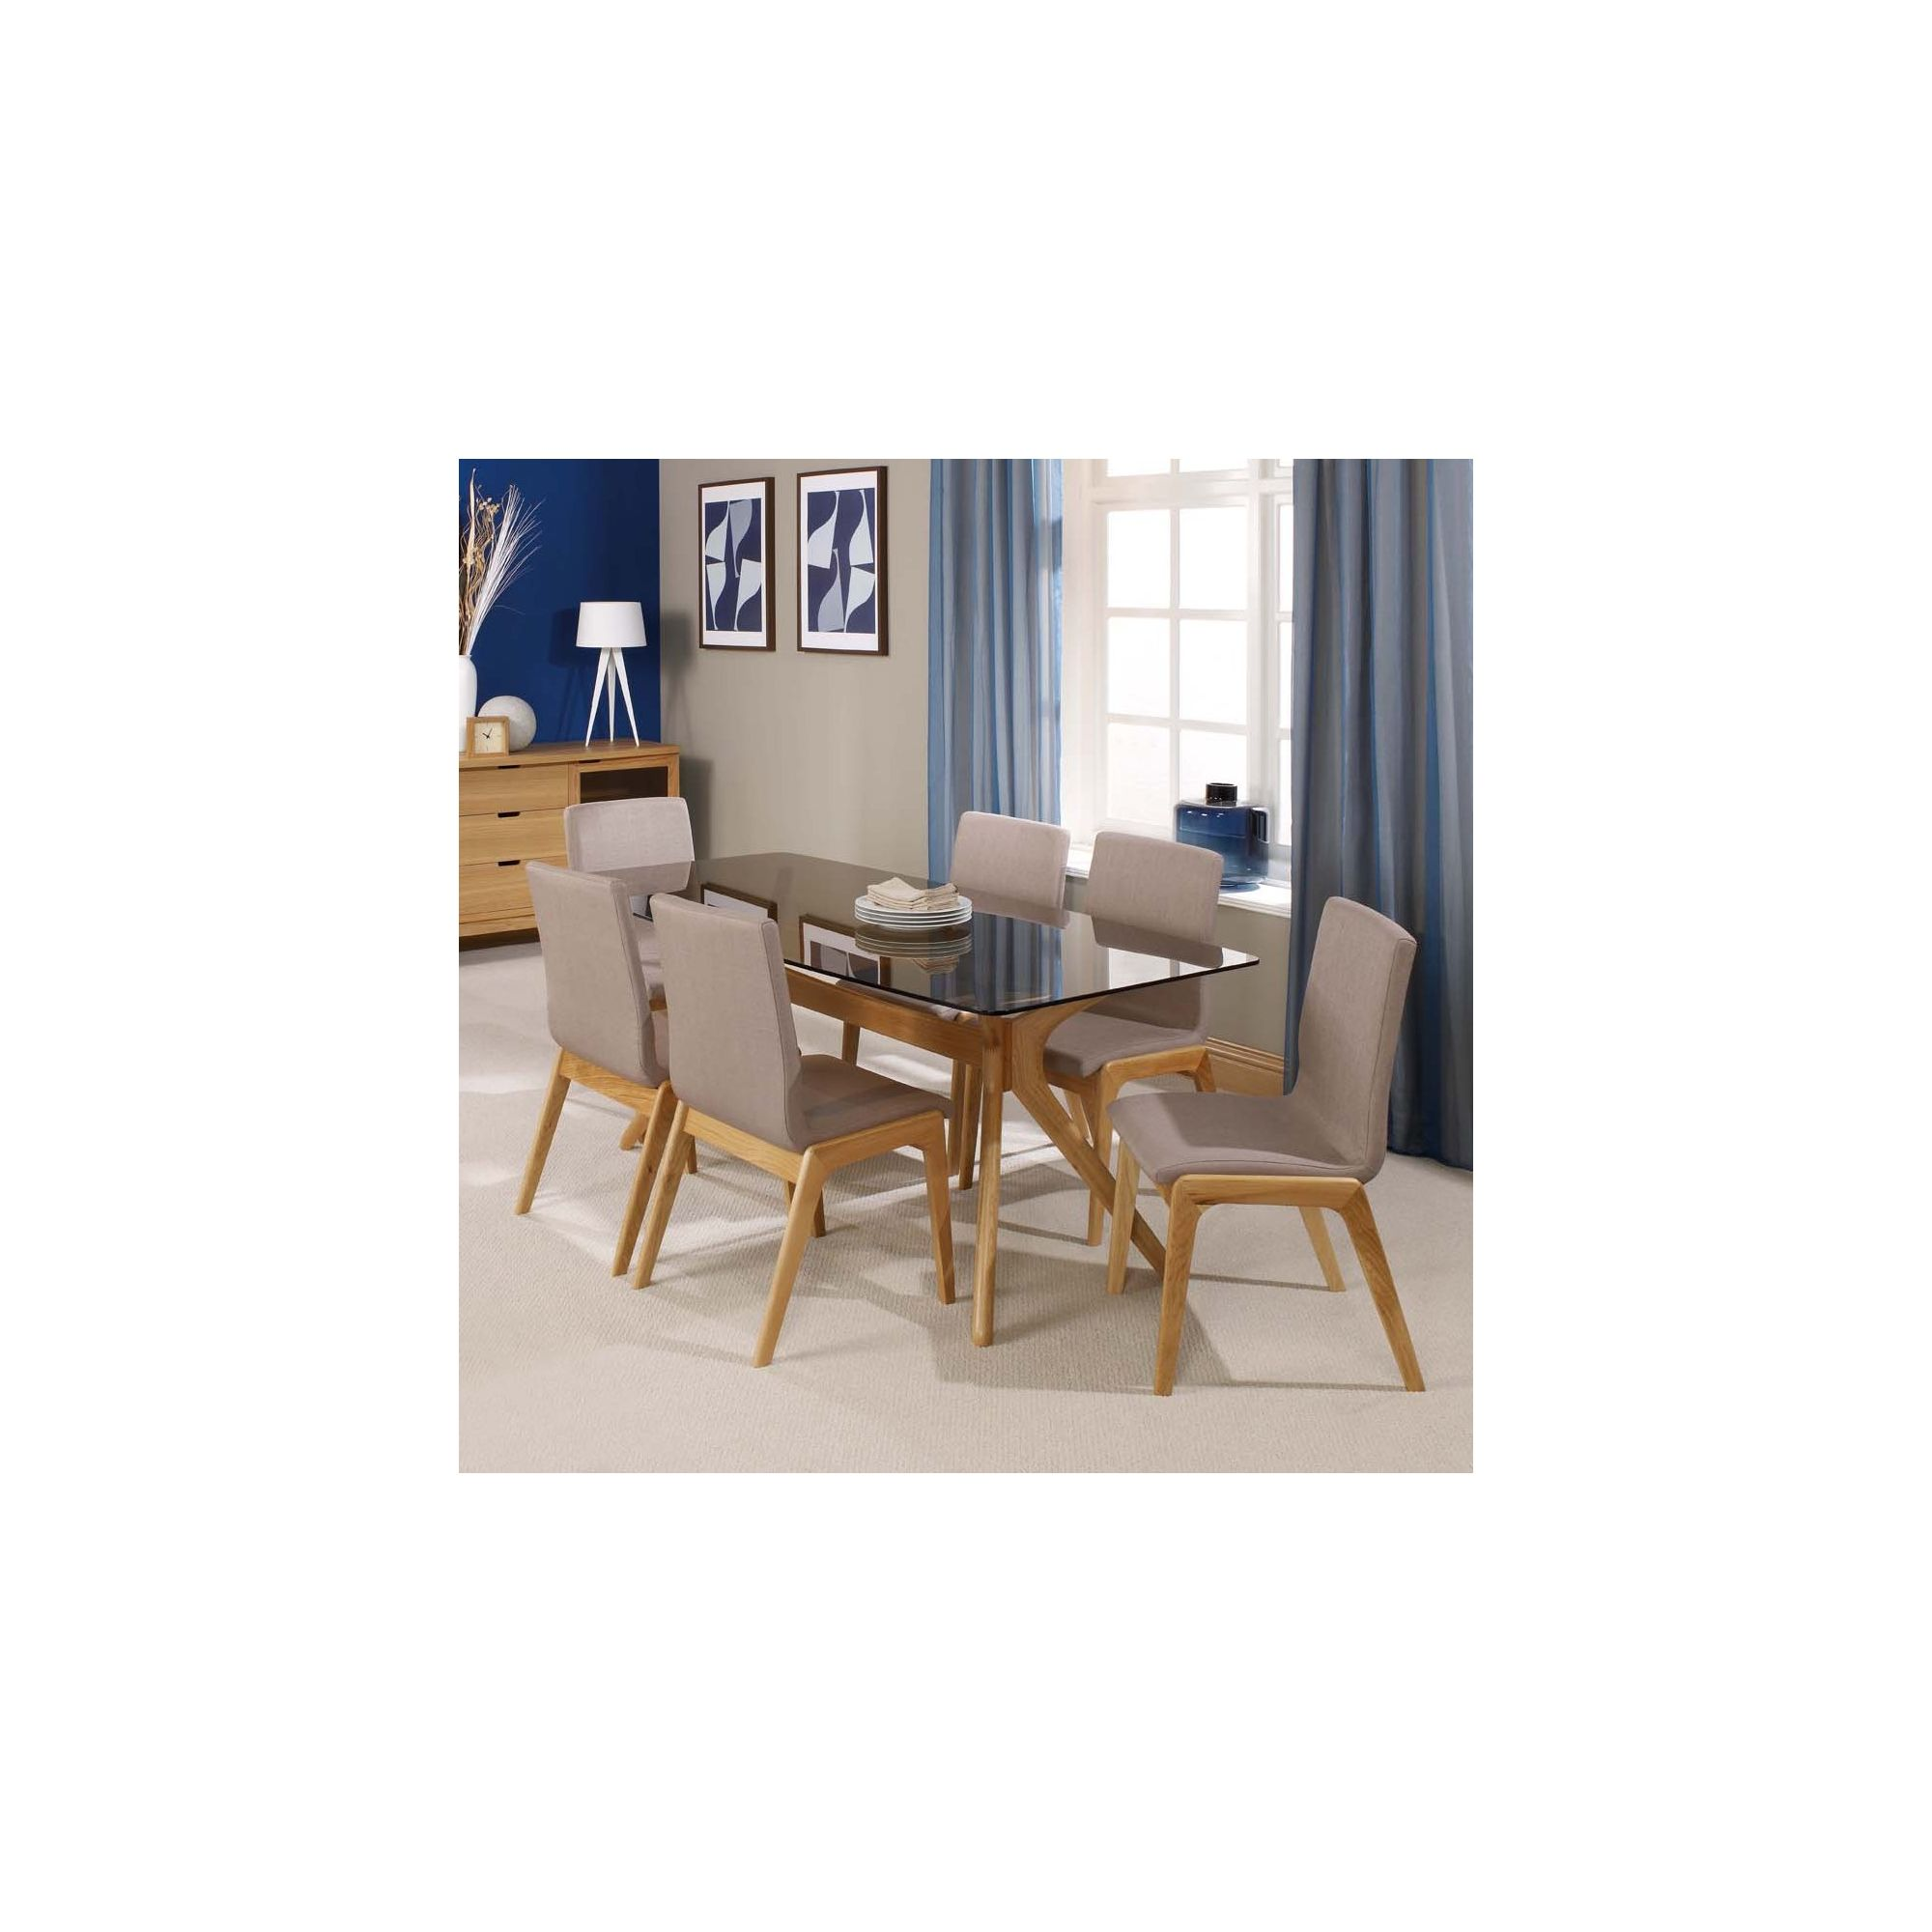 Home Zone Portofino 7 Piece Dining Table Set